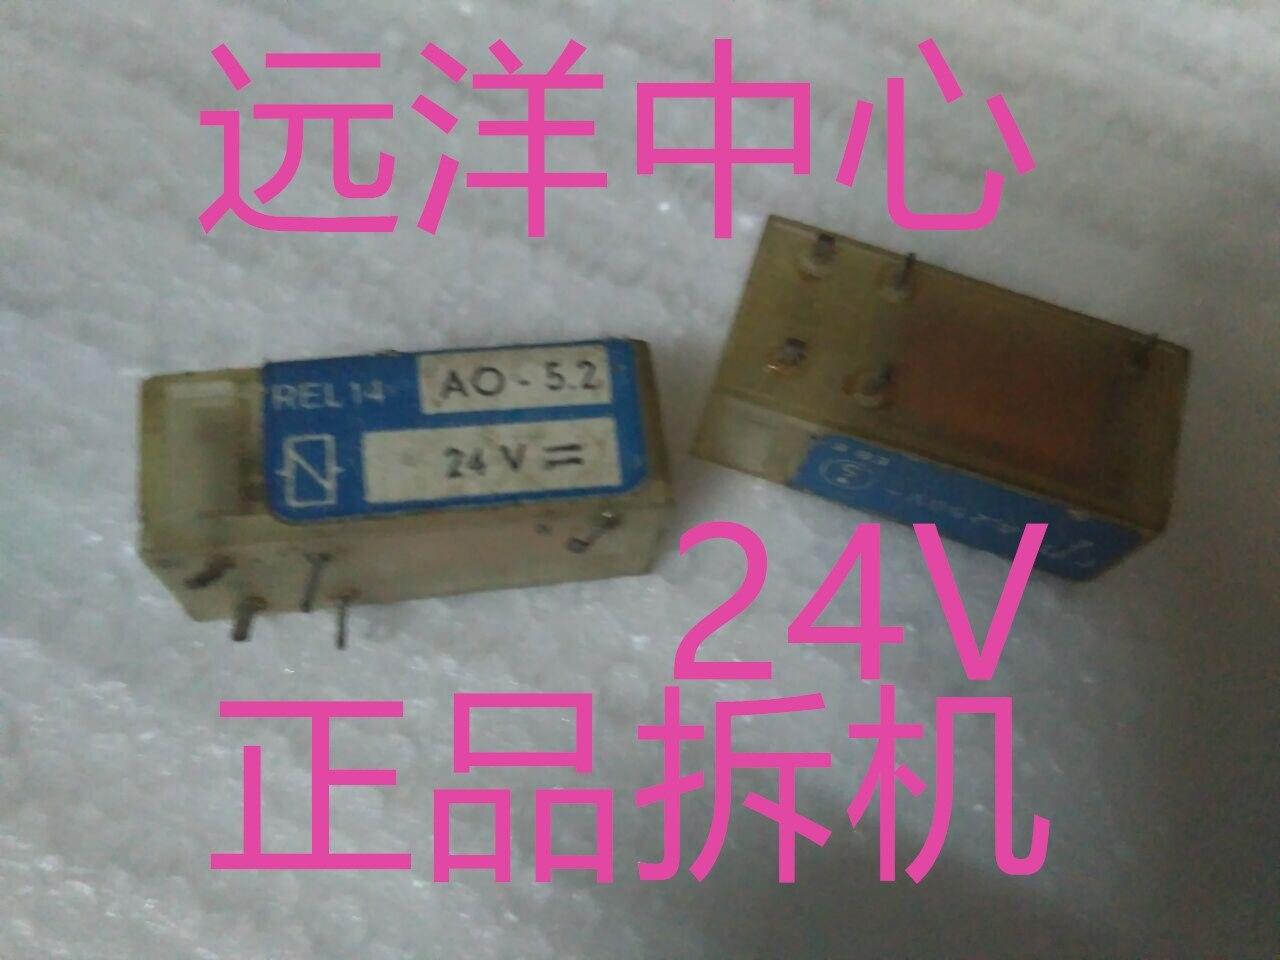 REL14 AO-5.2 24V  5 REL14-AO-5.2-24V  A0-5.2REL14 AO-5.2 24V  5 REL14-AO-5.2-24V  A0-5.2